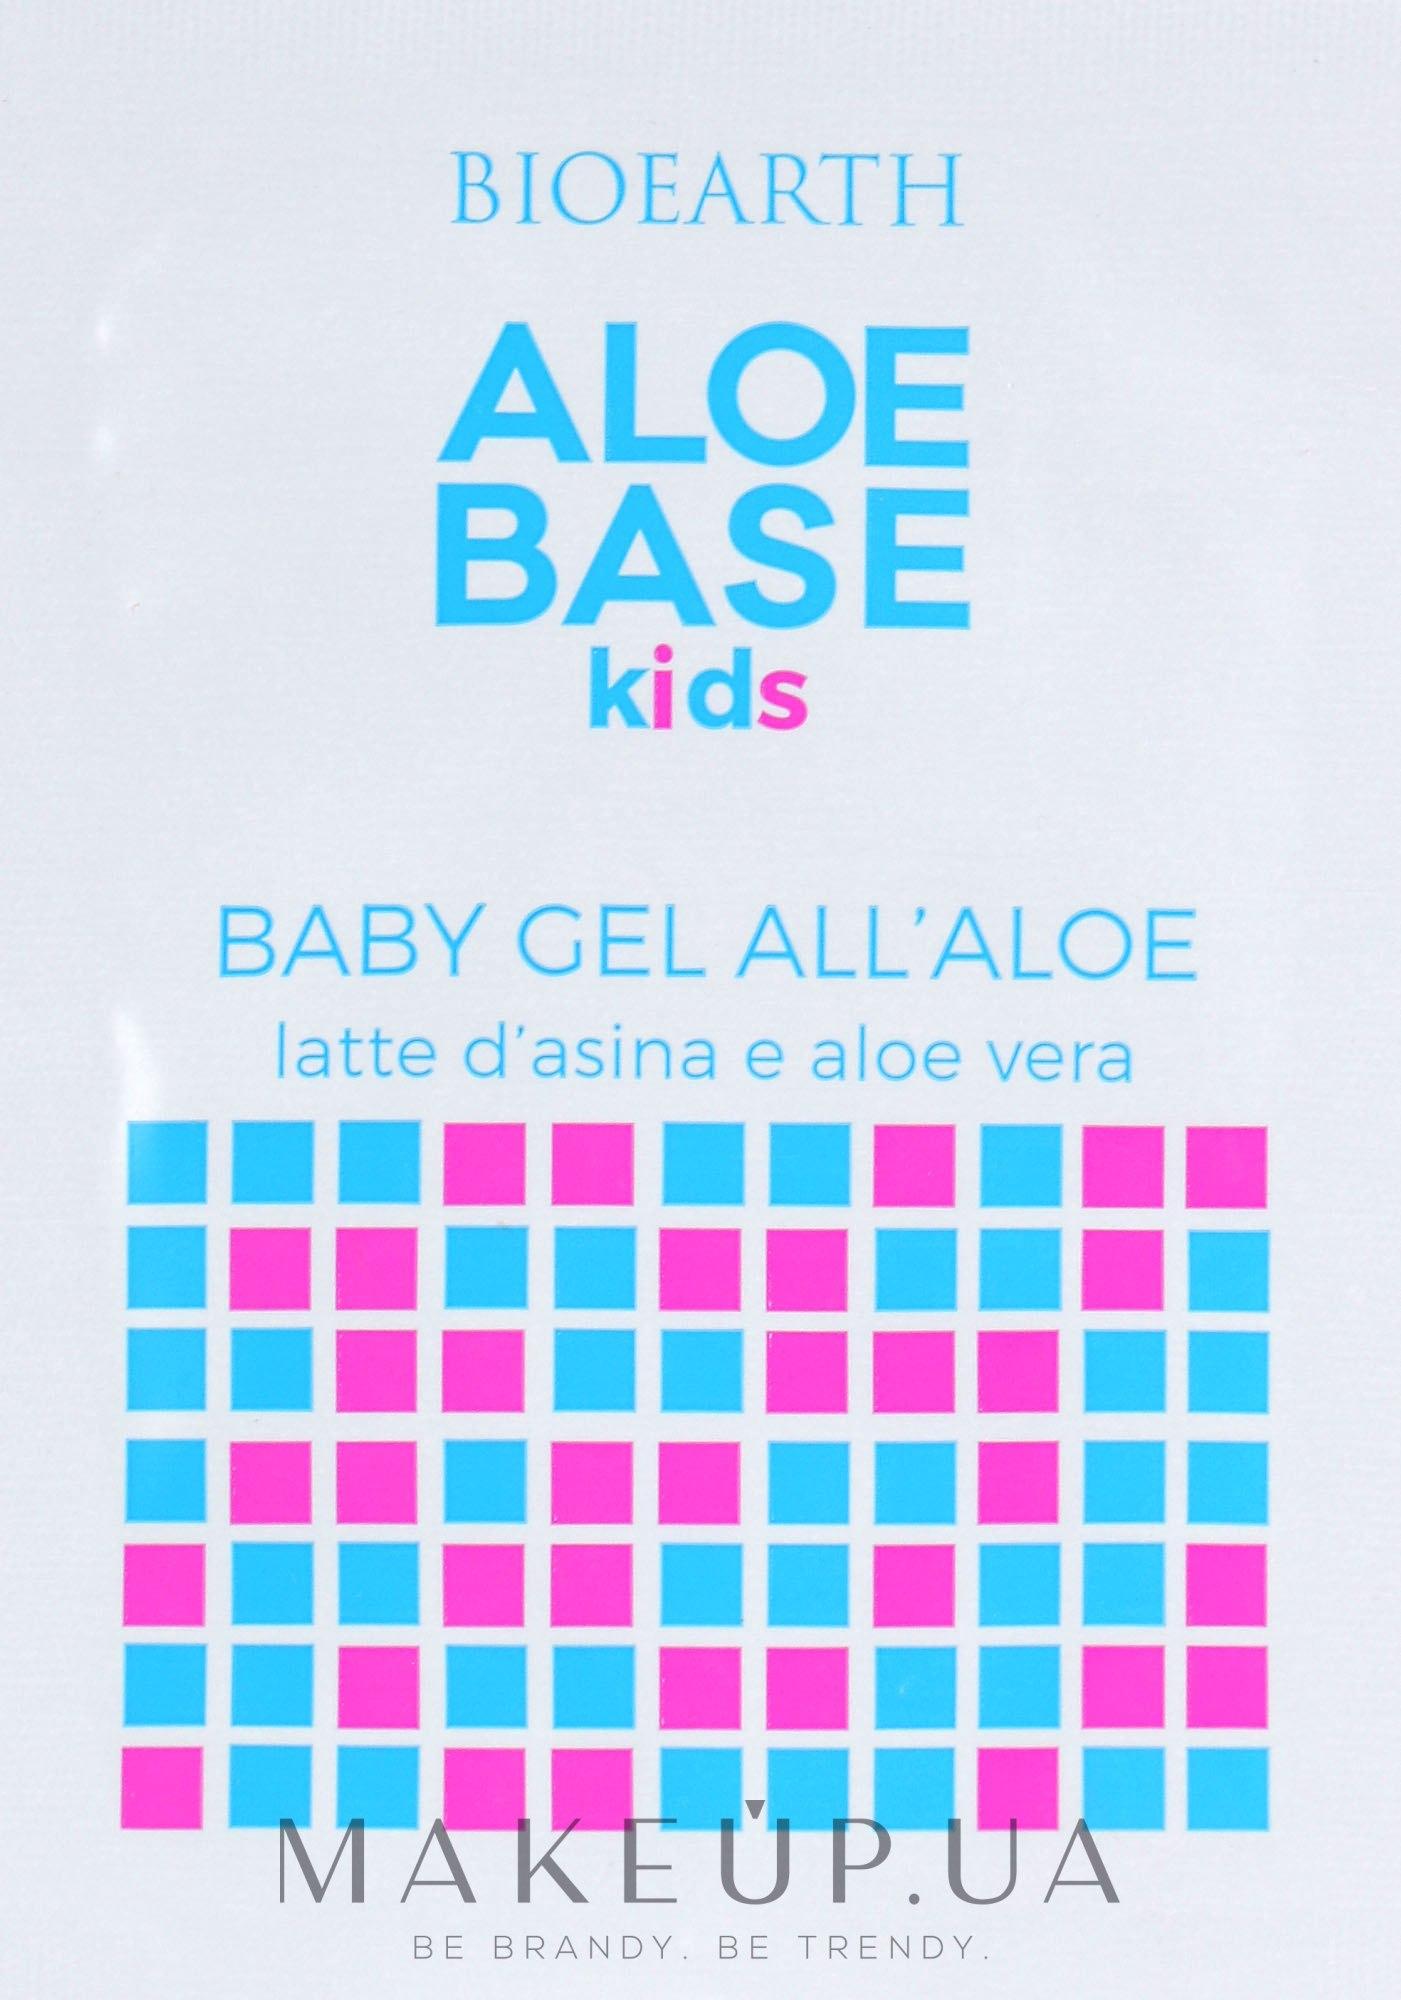 Детский увлажняющий гель на основе алоэ - Bioearth Aloebase Kids Aloe Vera baby Gel with Donkey Milk (пробник) — фото 3ml